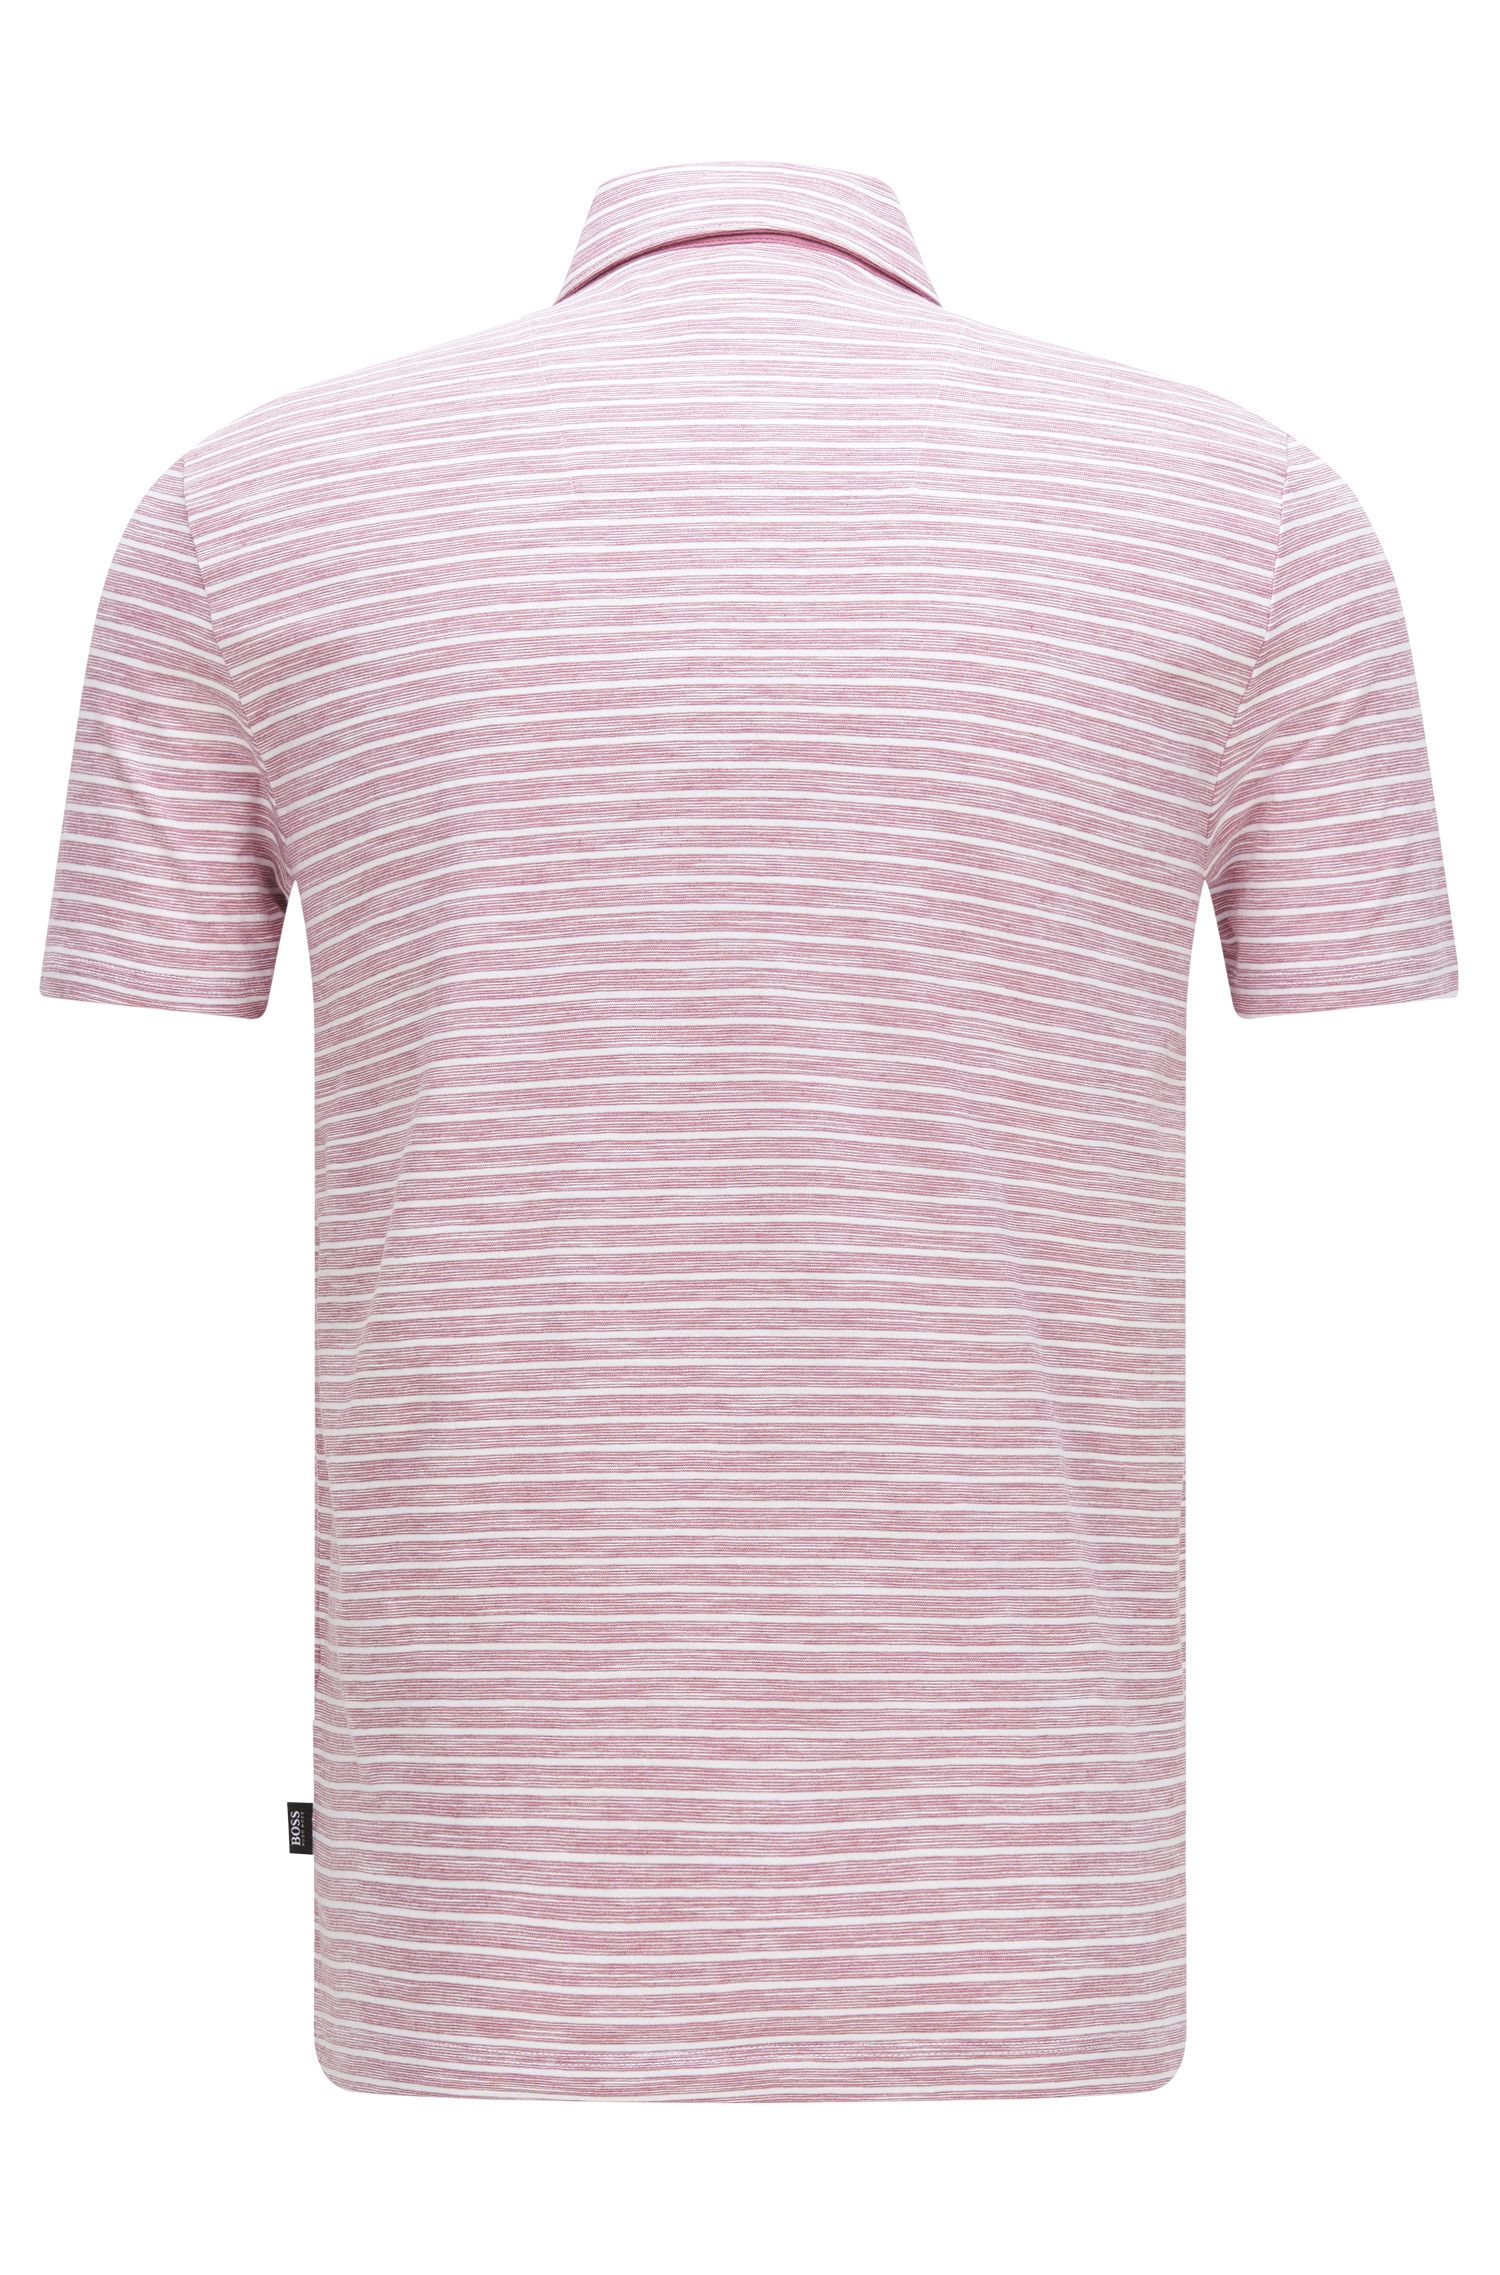 Cotton Striped Polo Shirt, Slim Fit | Platt, Pink